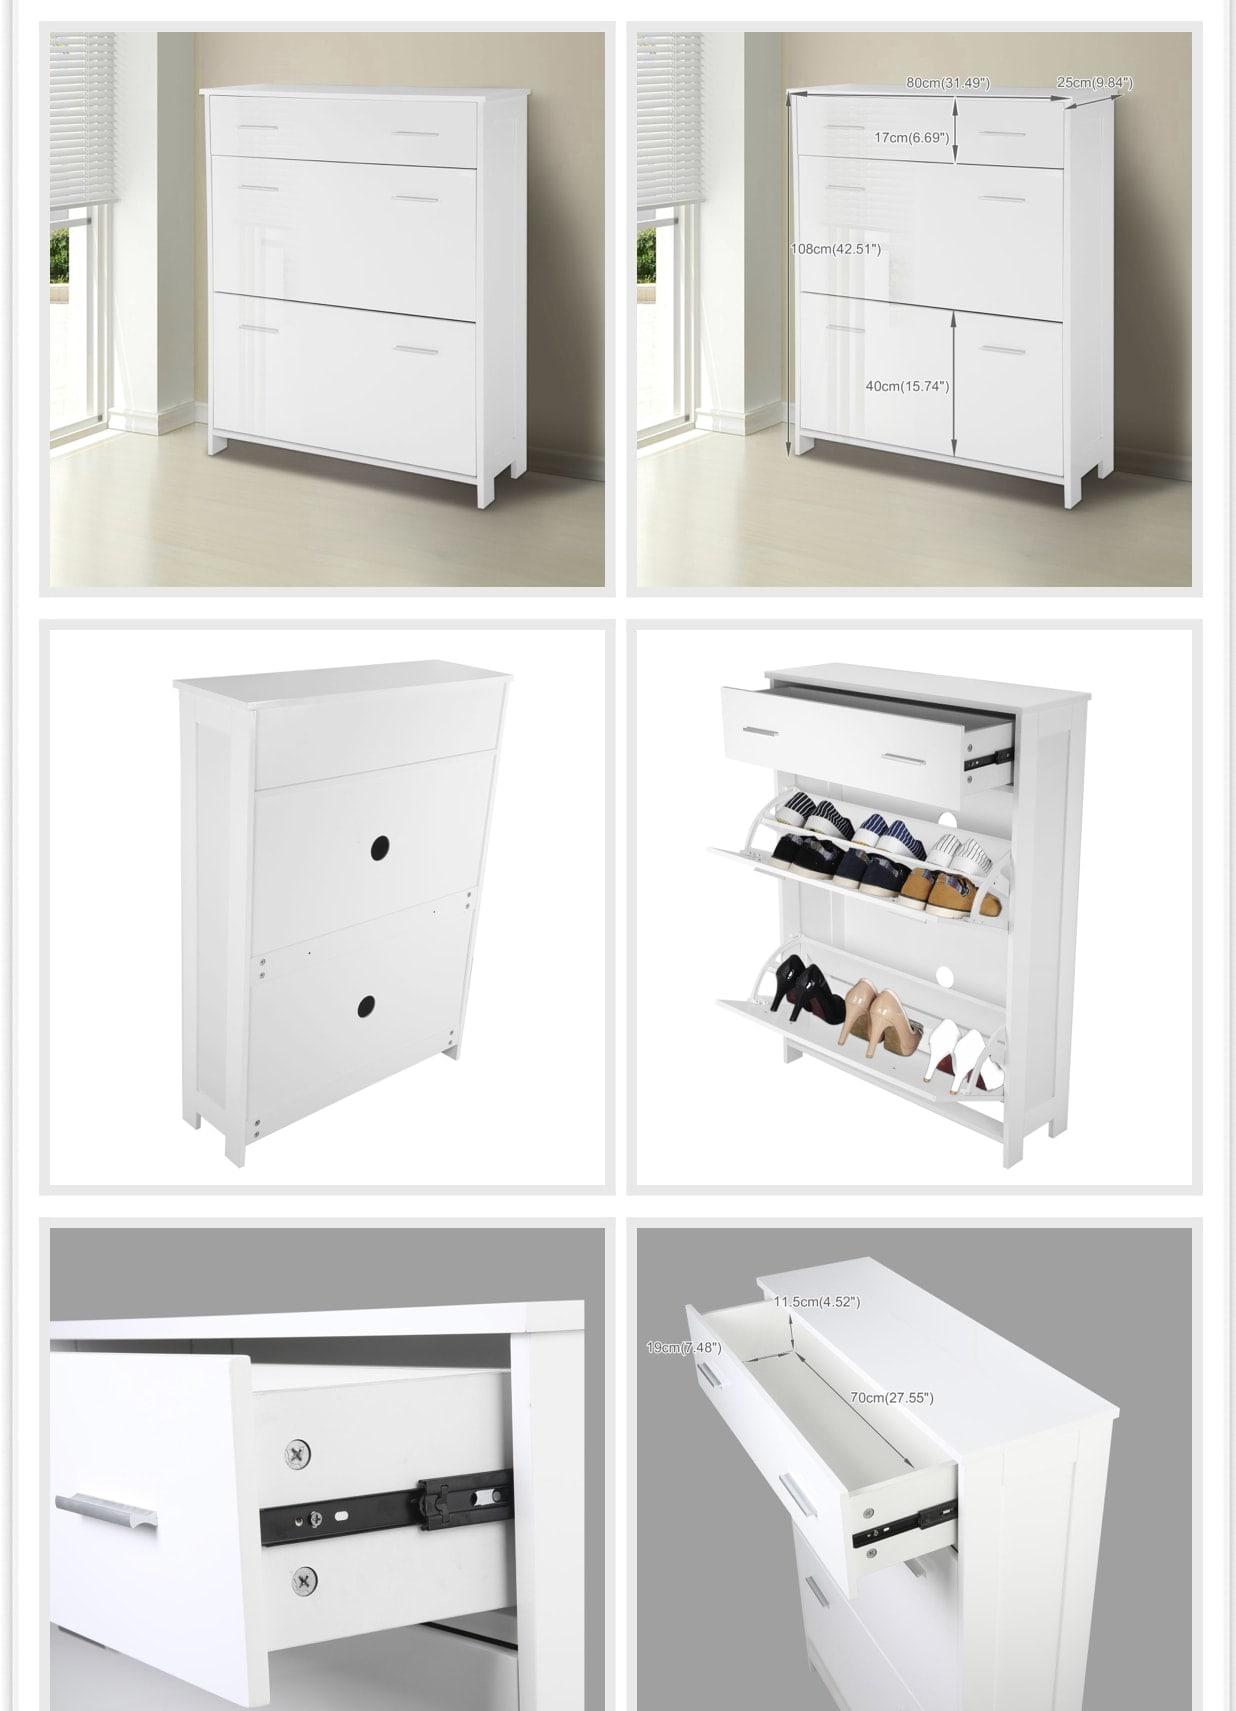 Flat pack furniture assemble & handyman Service | Liverpool L14 8AA | +44 7428 729773